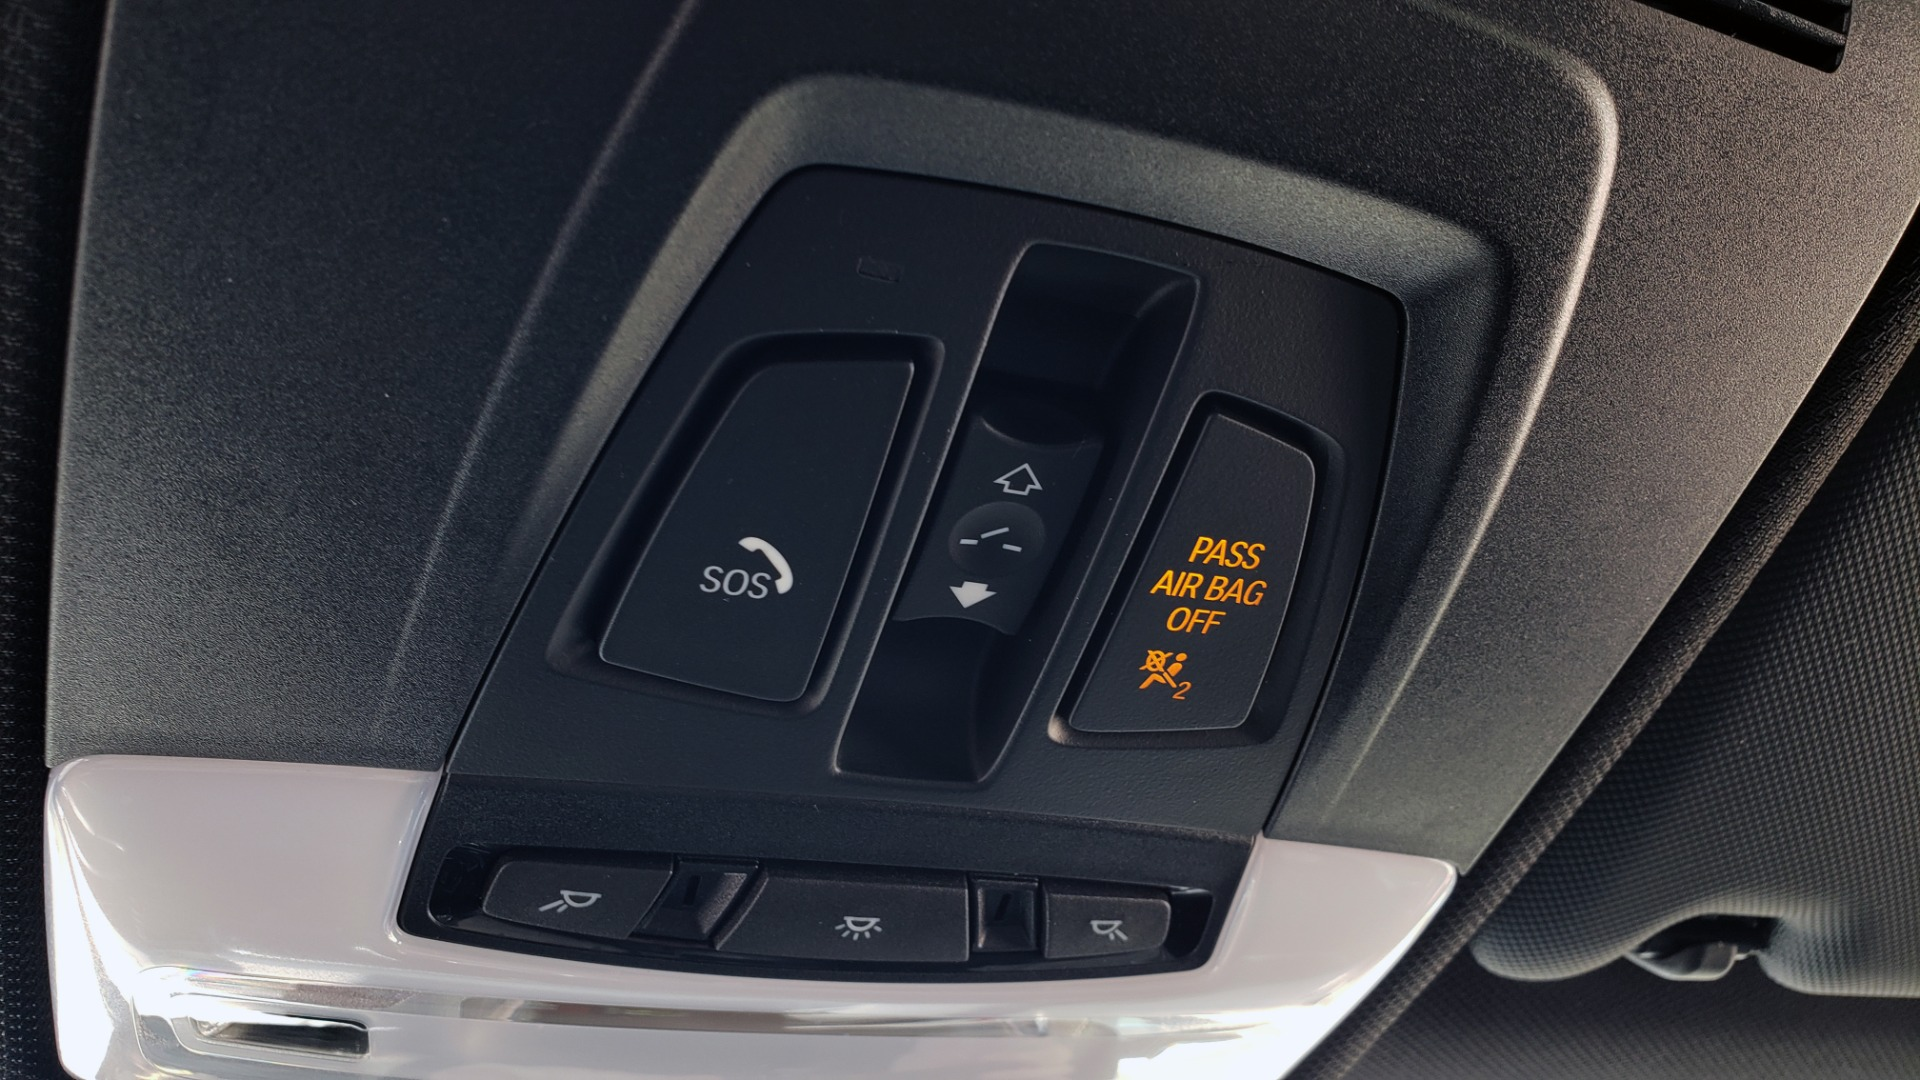 Used 2018 BMW 4 SERIES 430IXDRIVE / PREMIUM / NAV / SUNROOF / ESSENTIALS PKG for sale $28,995 at Formula Imports in Charlotte NC 28227 57